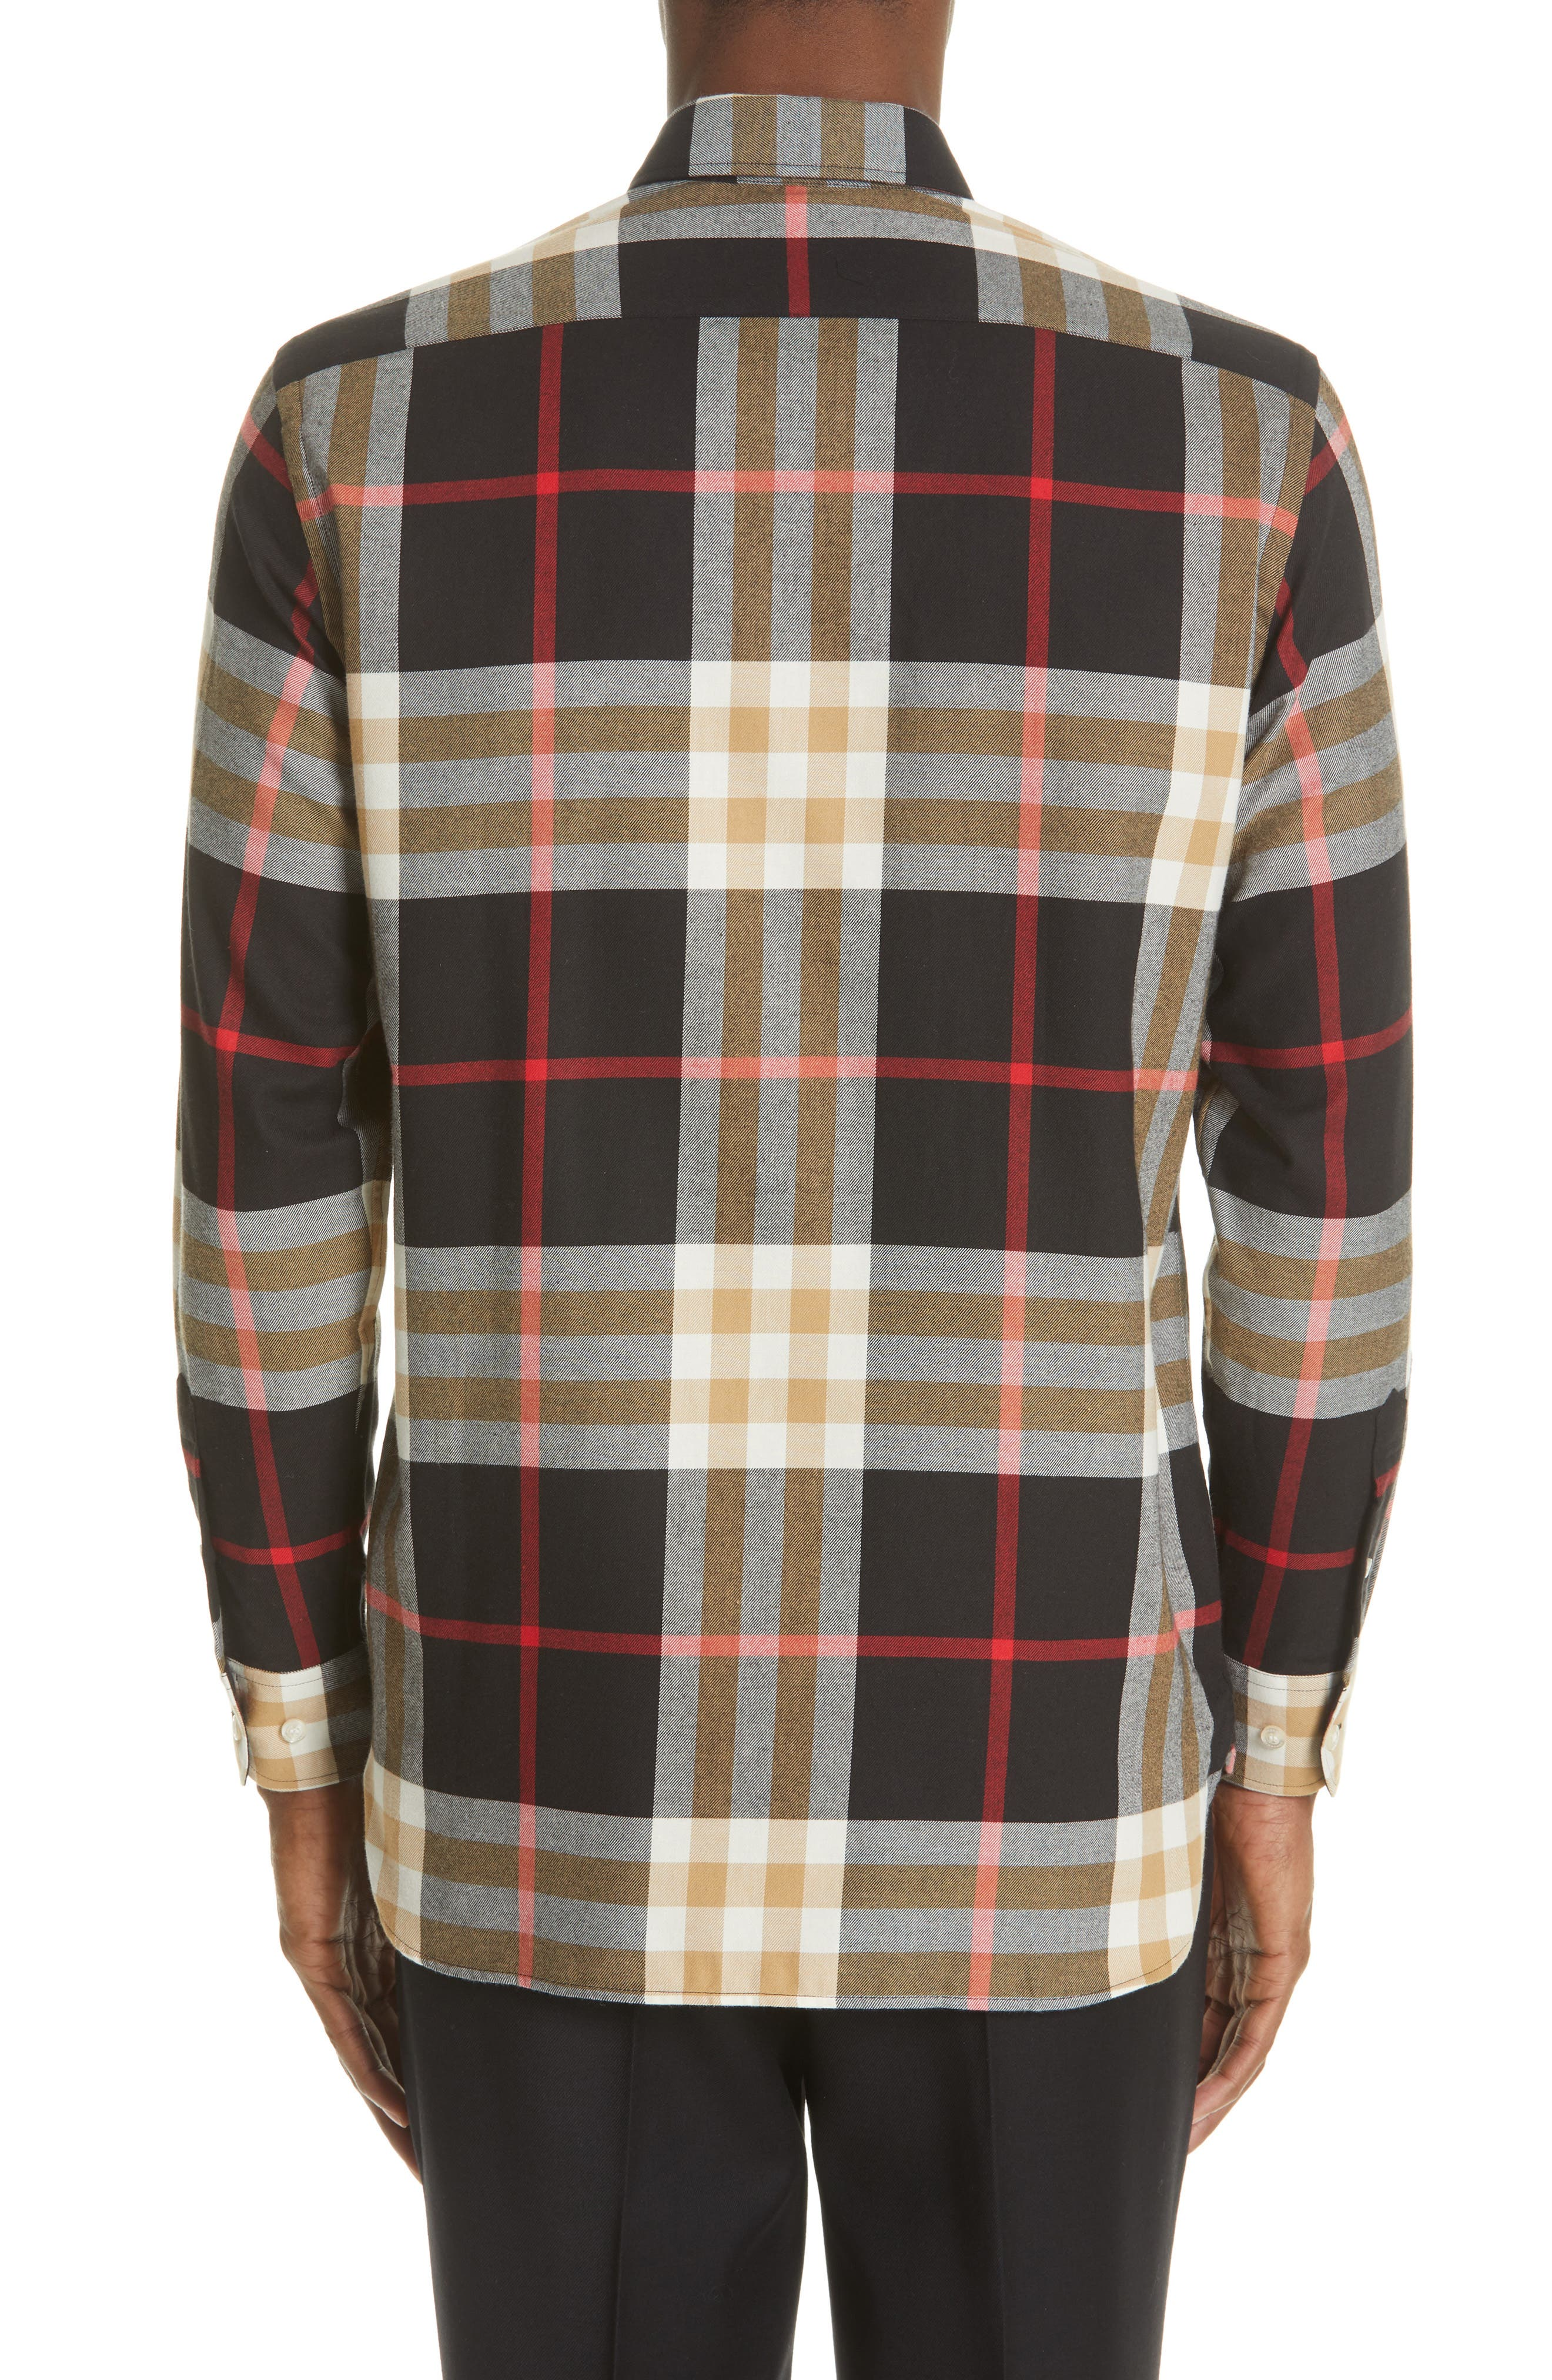 BURBERRY, Richard Slim Fit Plaid Sport Shirt, Alternate thumbnail 3, color, BLACK CHECK